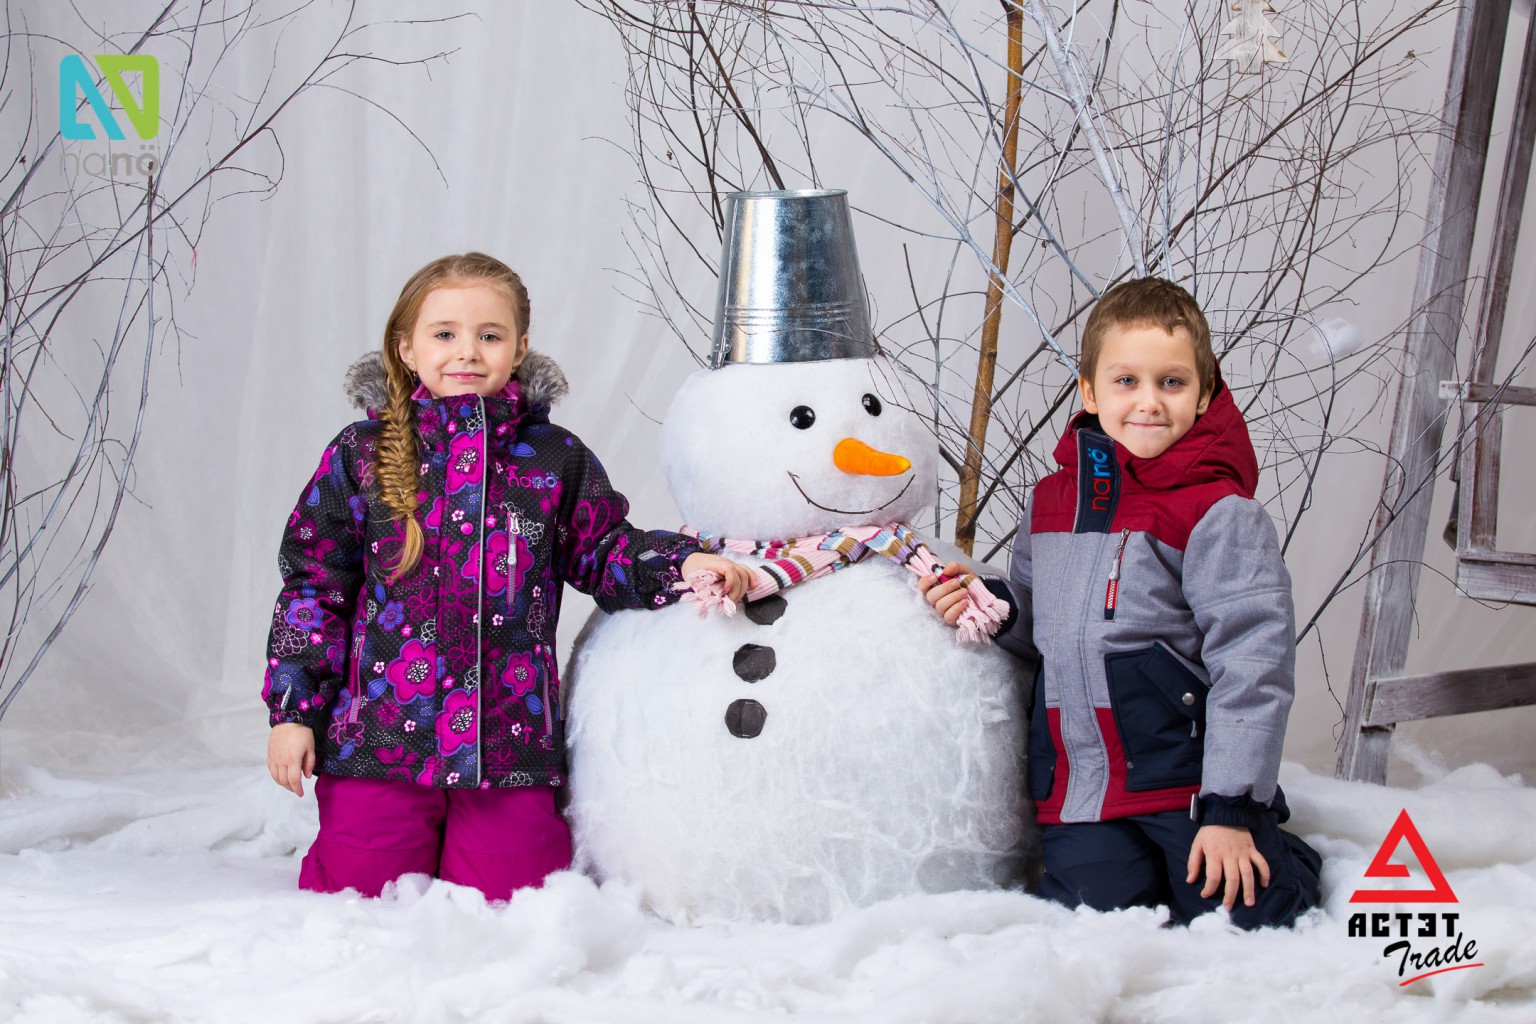 Сбор заказов. Яркое N a n o - детство из Канады. Предзаказ Зима 2016-17. (Свободного склада и распродаж не будет!)